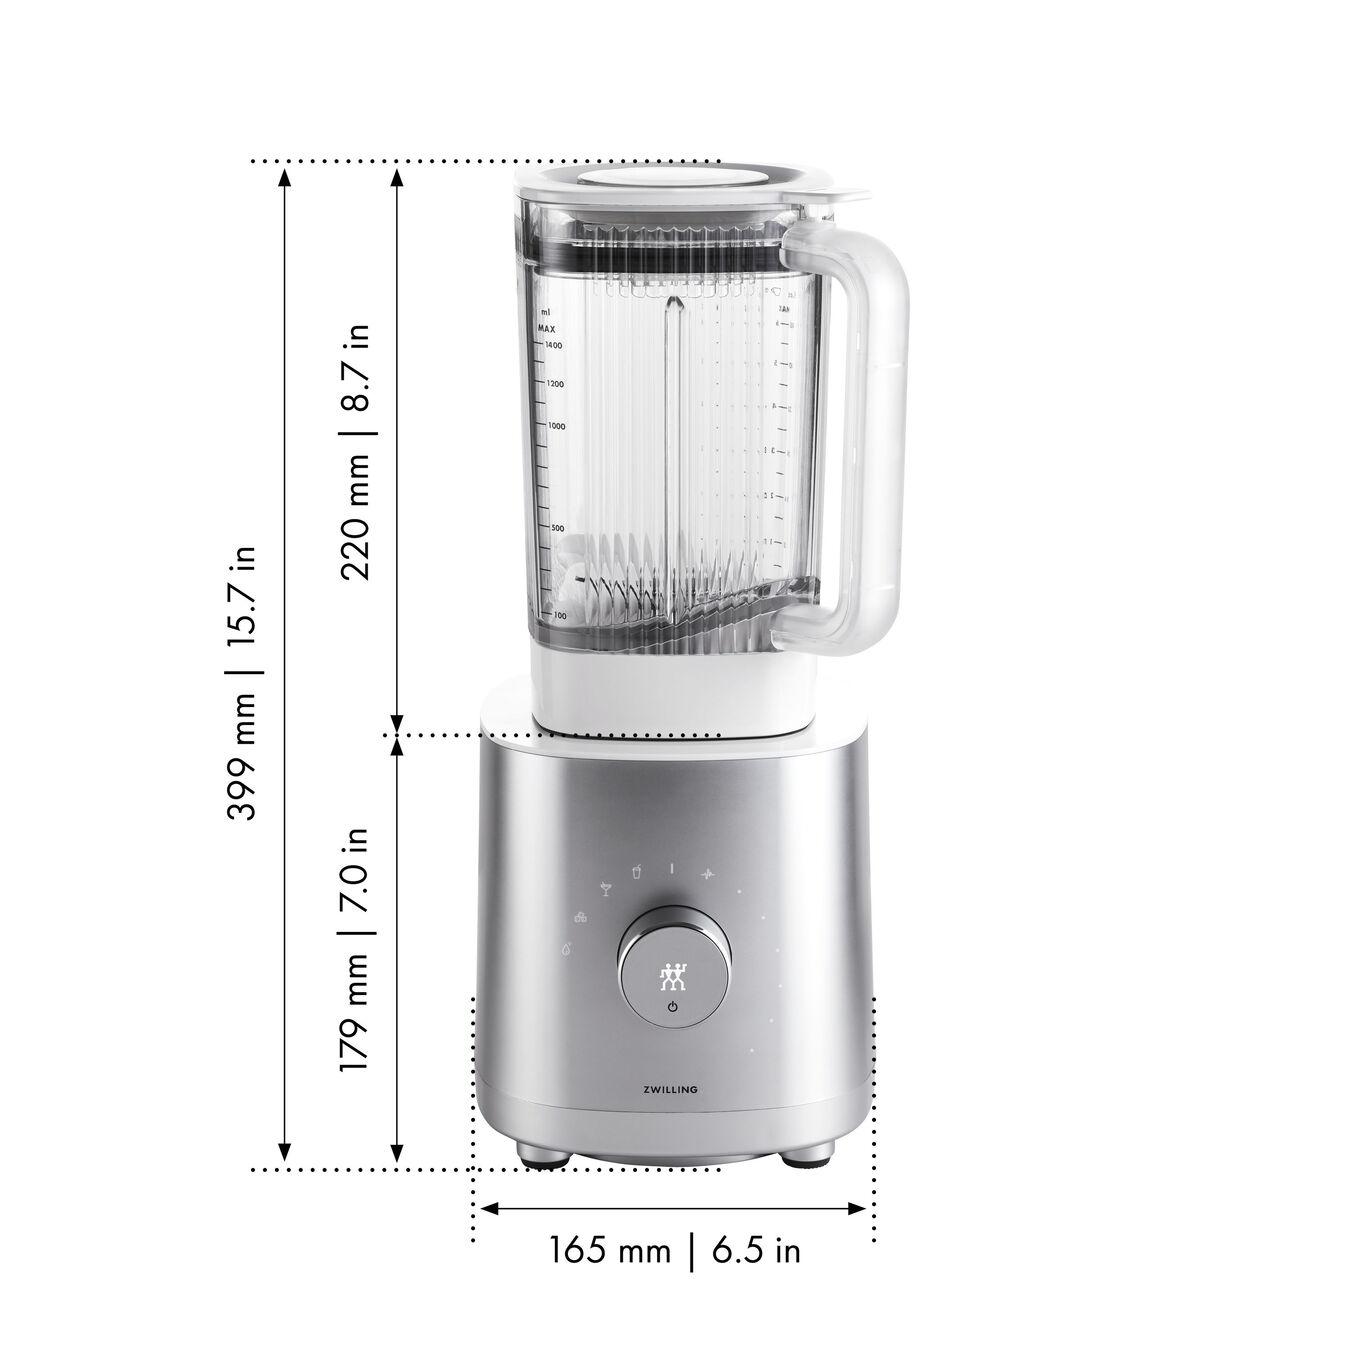 Table Blender - AC Motor, argento,,large 10